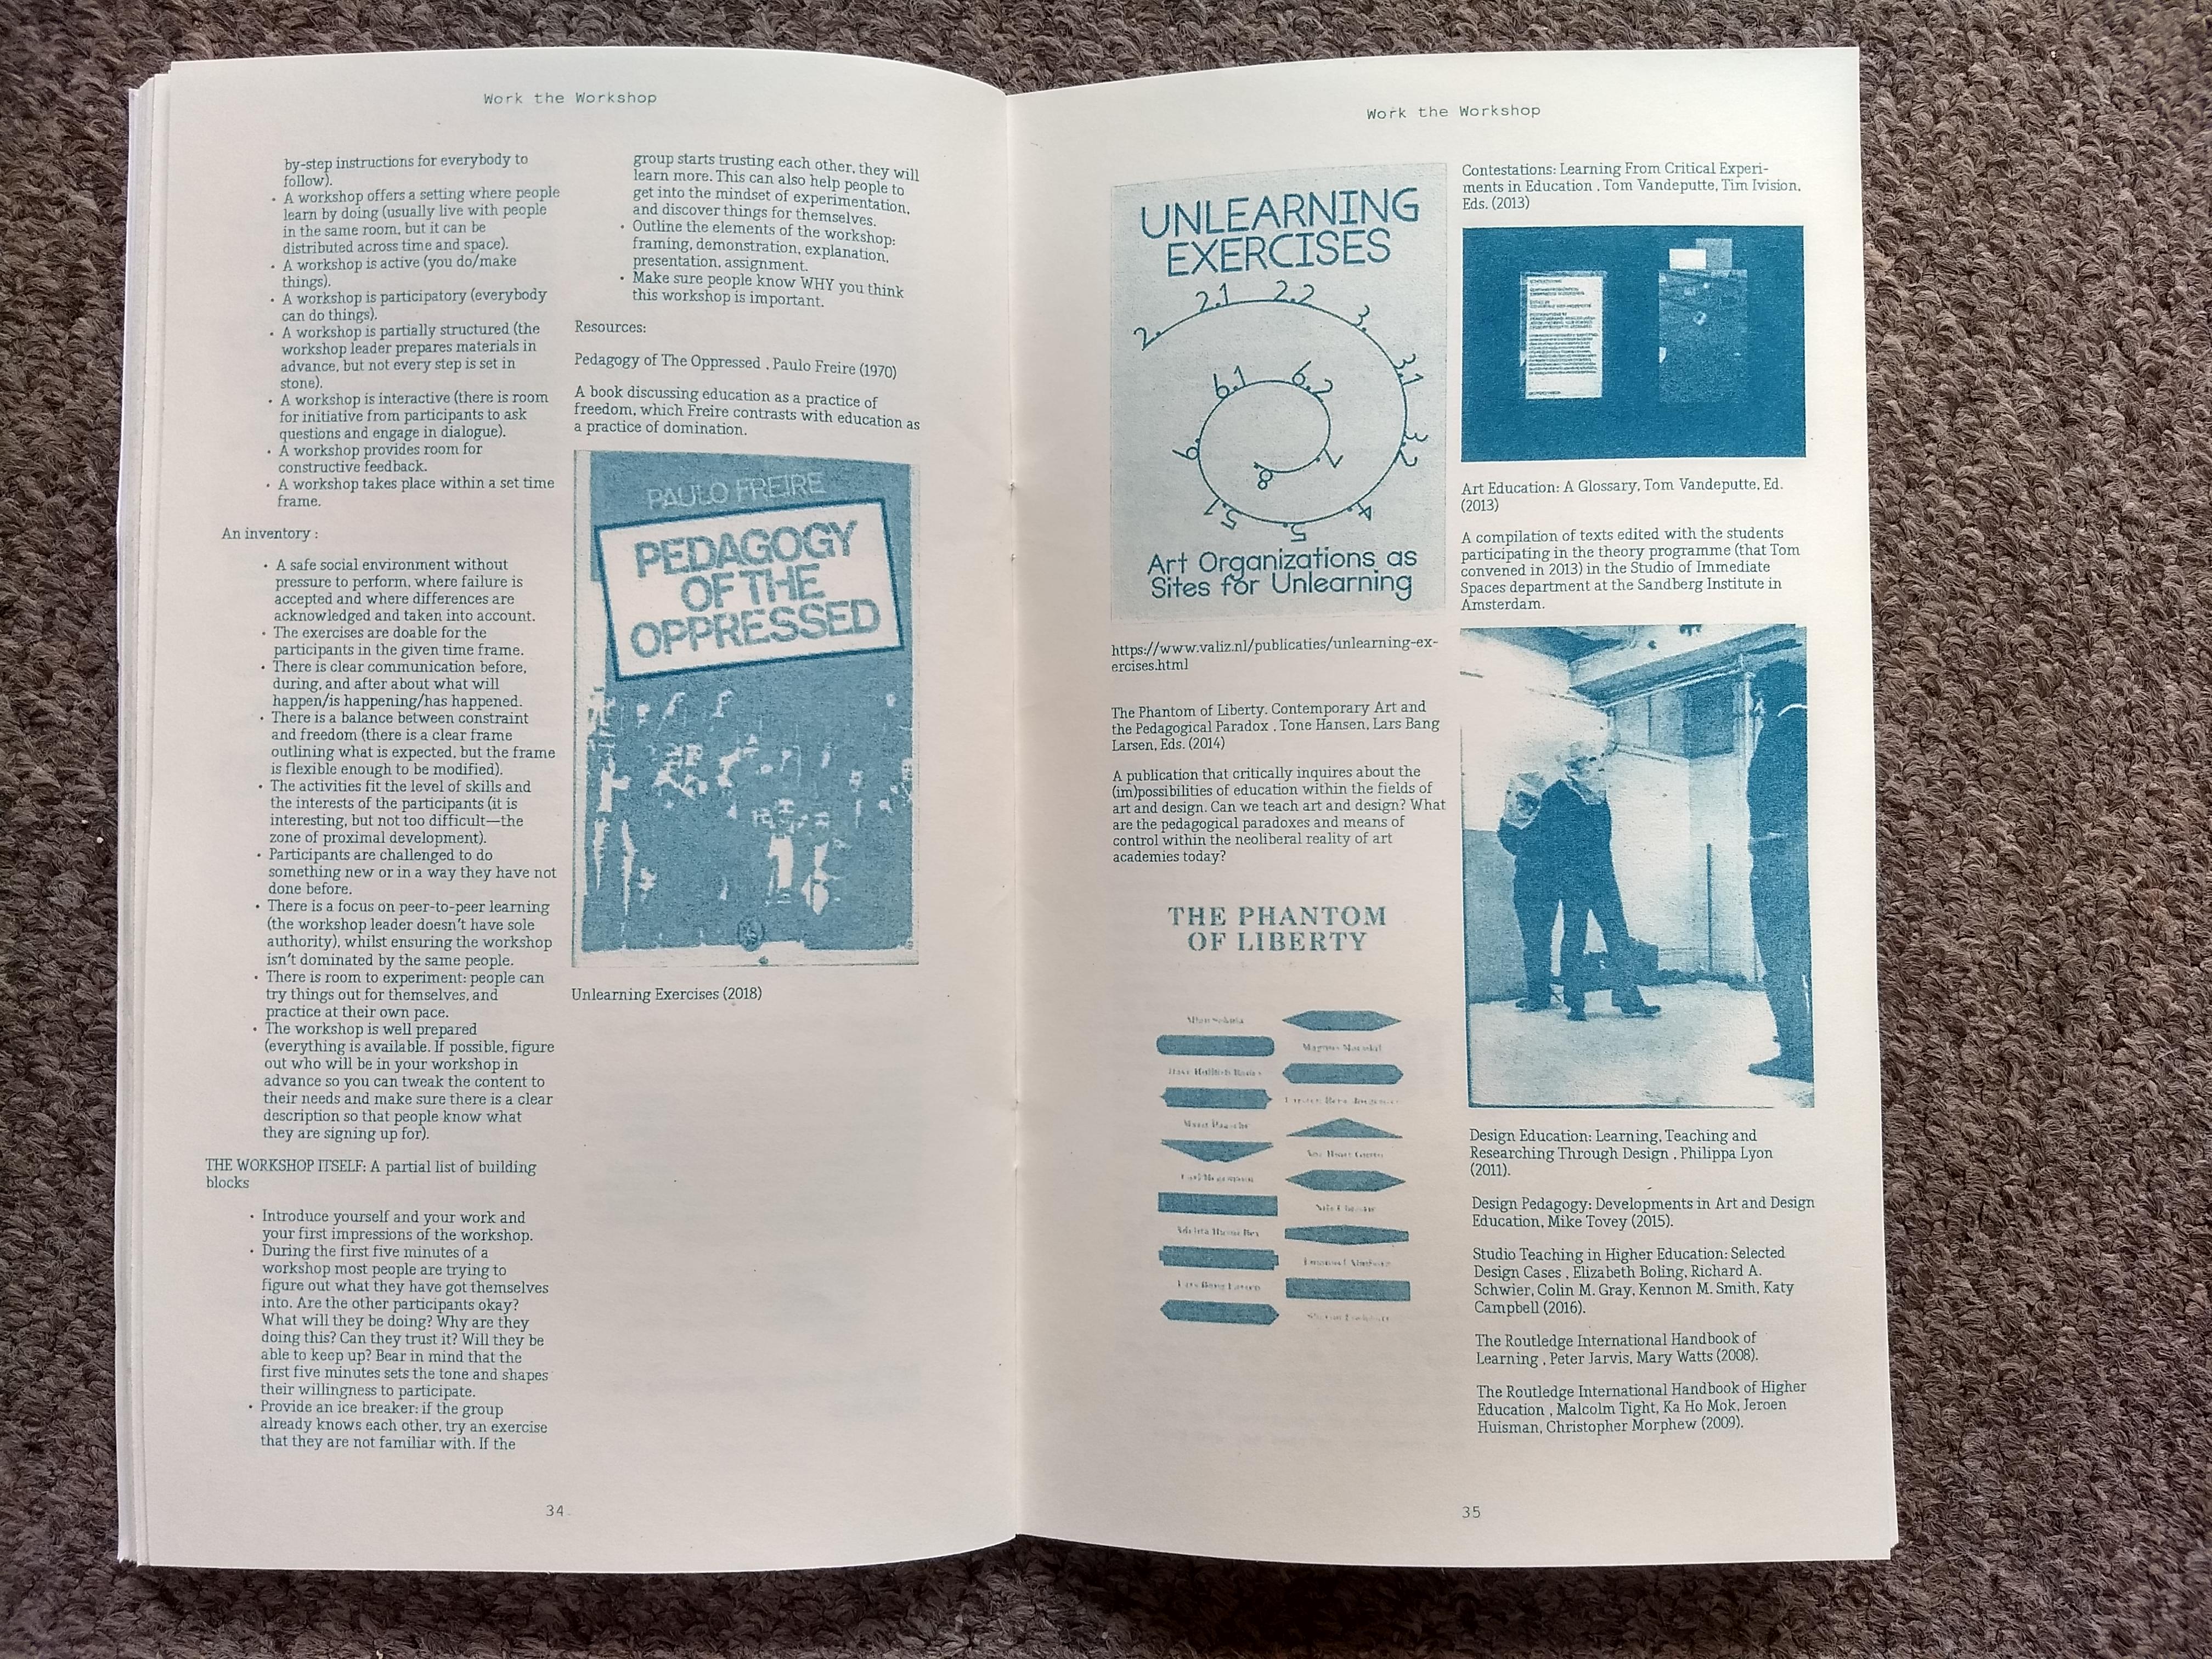 FlaskApp/static/images/samples-of-work/publications/hnd-fake-it12.jpg